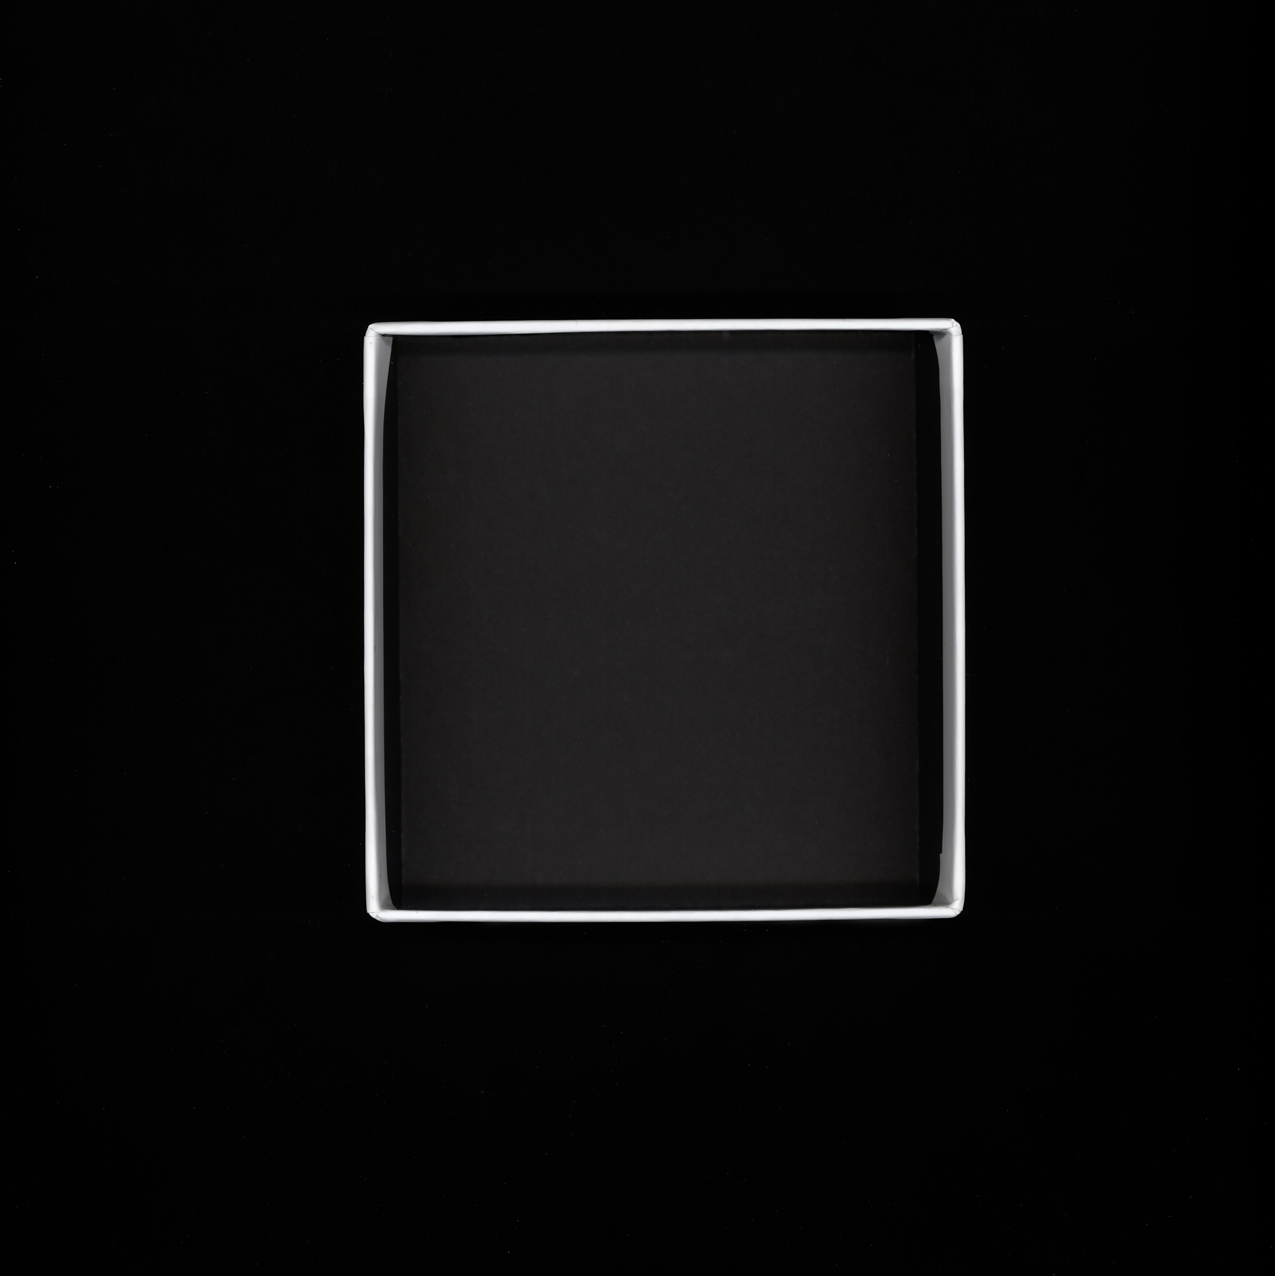 ZI, 80x80 -  2012